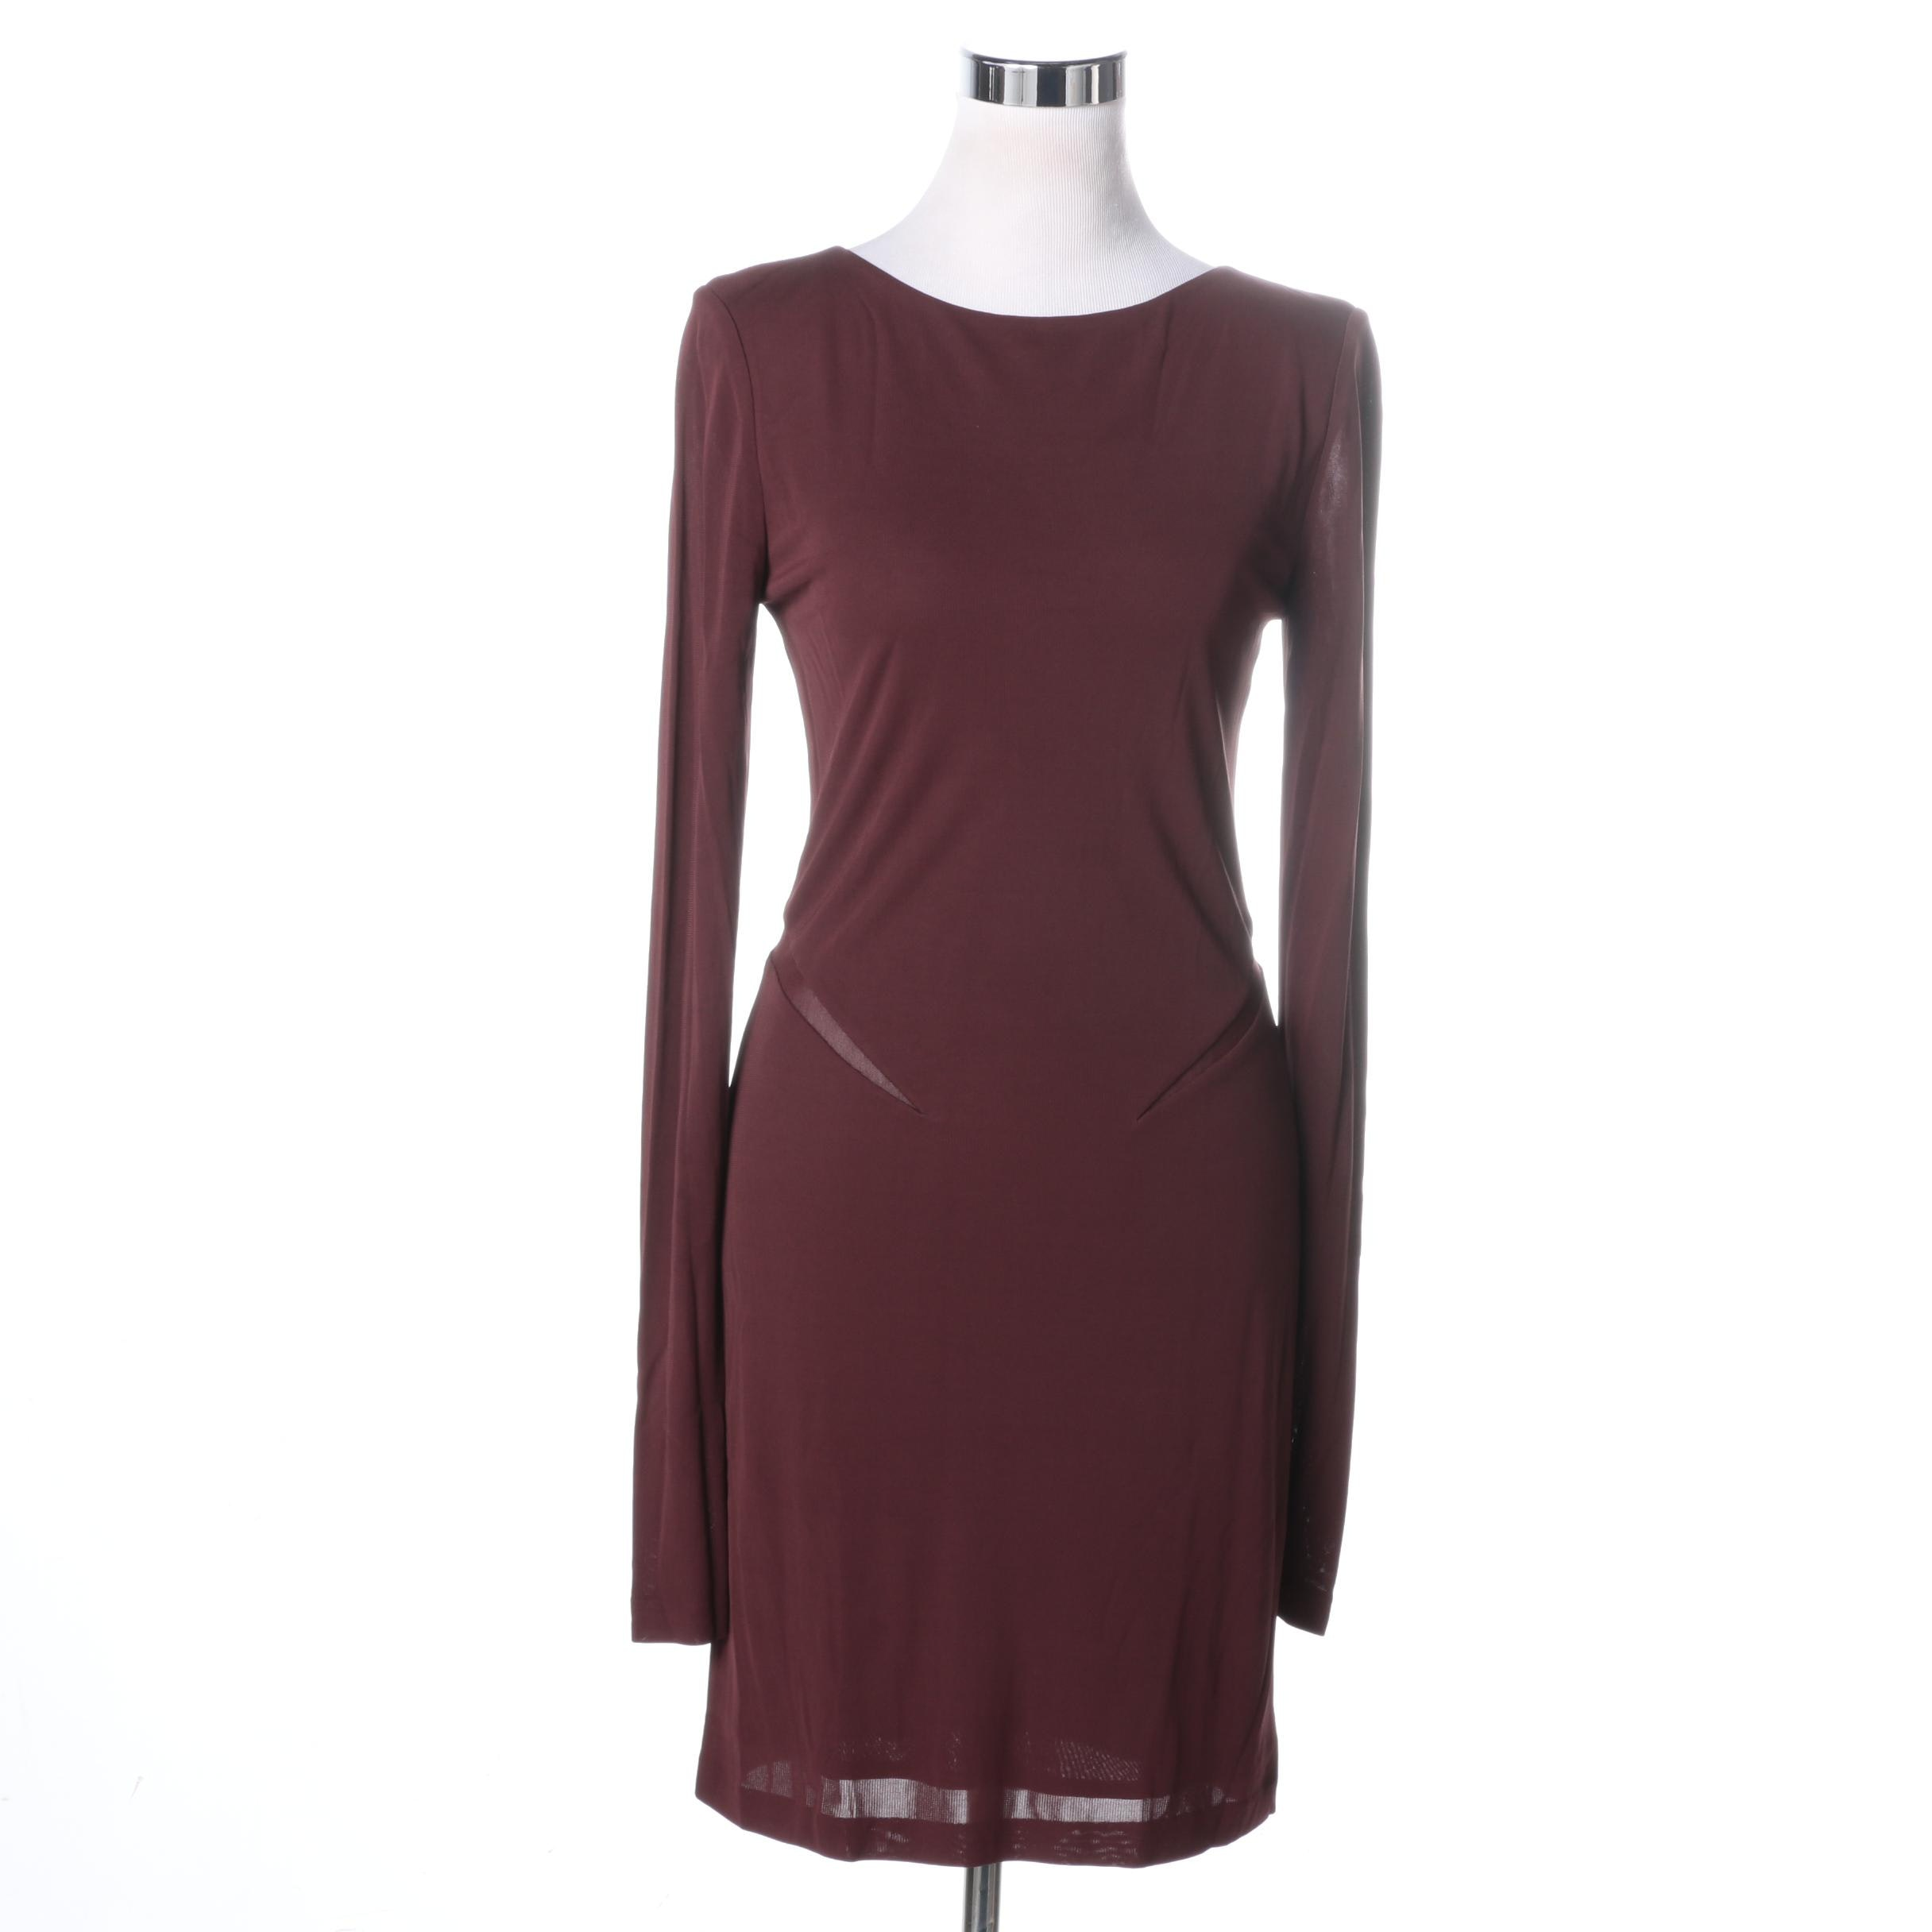 T by Alexander Wang Burgundy Dress